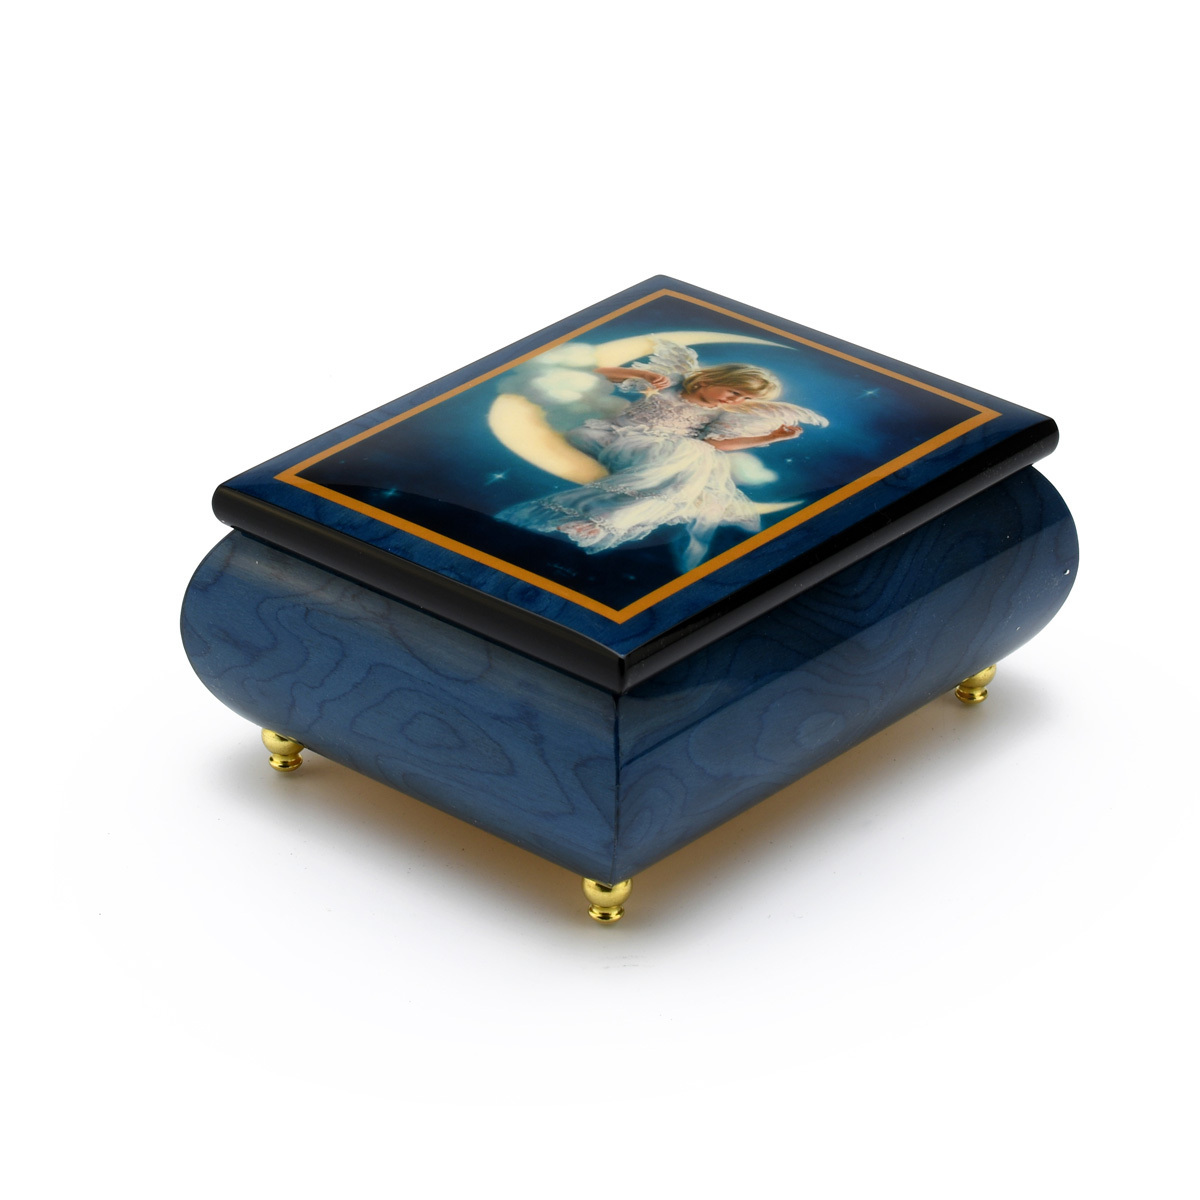 Enchanting Blue Ercolano Painted Music Box Titled Moonbeam by Brenda Burke